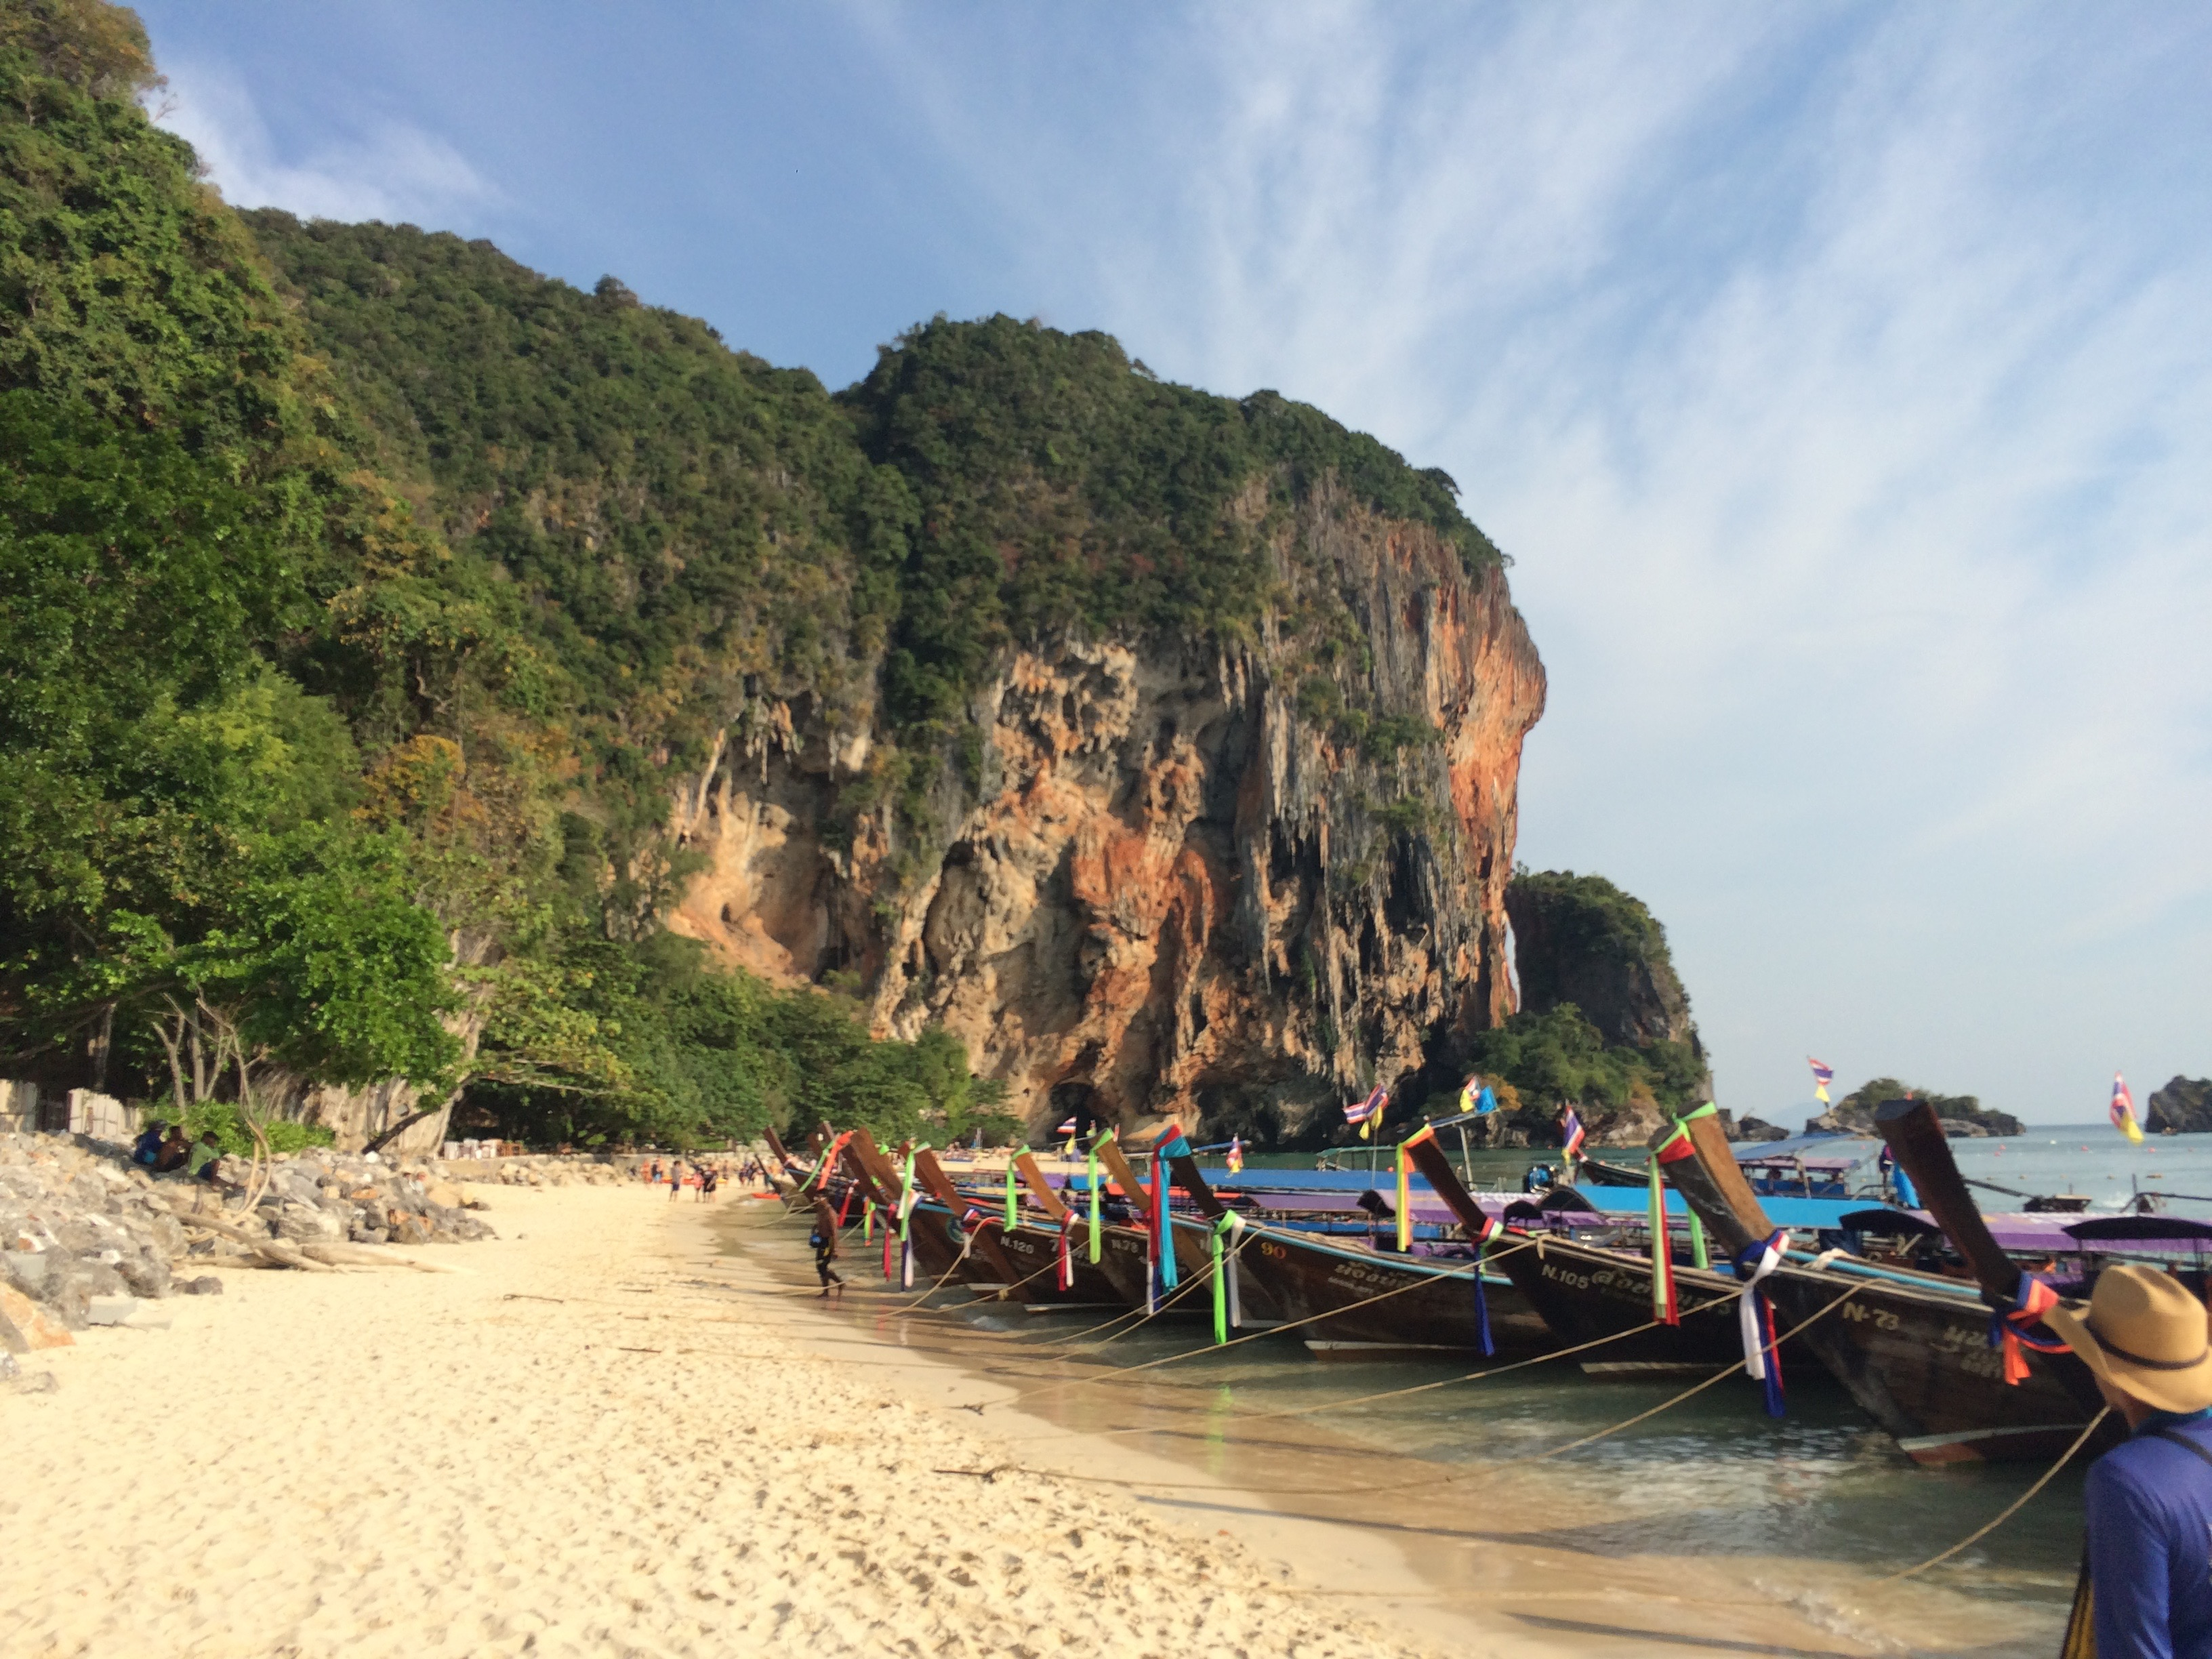 Long tail boats em Phra Nang Beach. (Foto: Nathalia Tavolieri / Viagem em Detalhes)